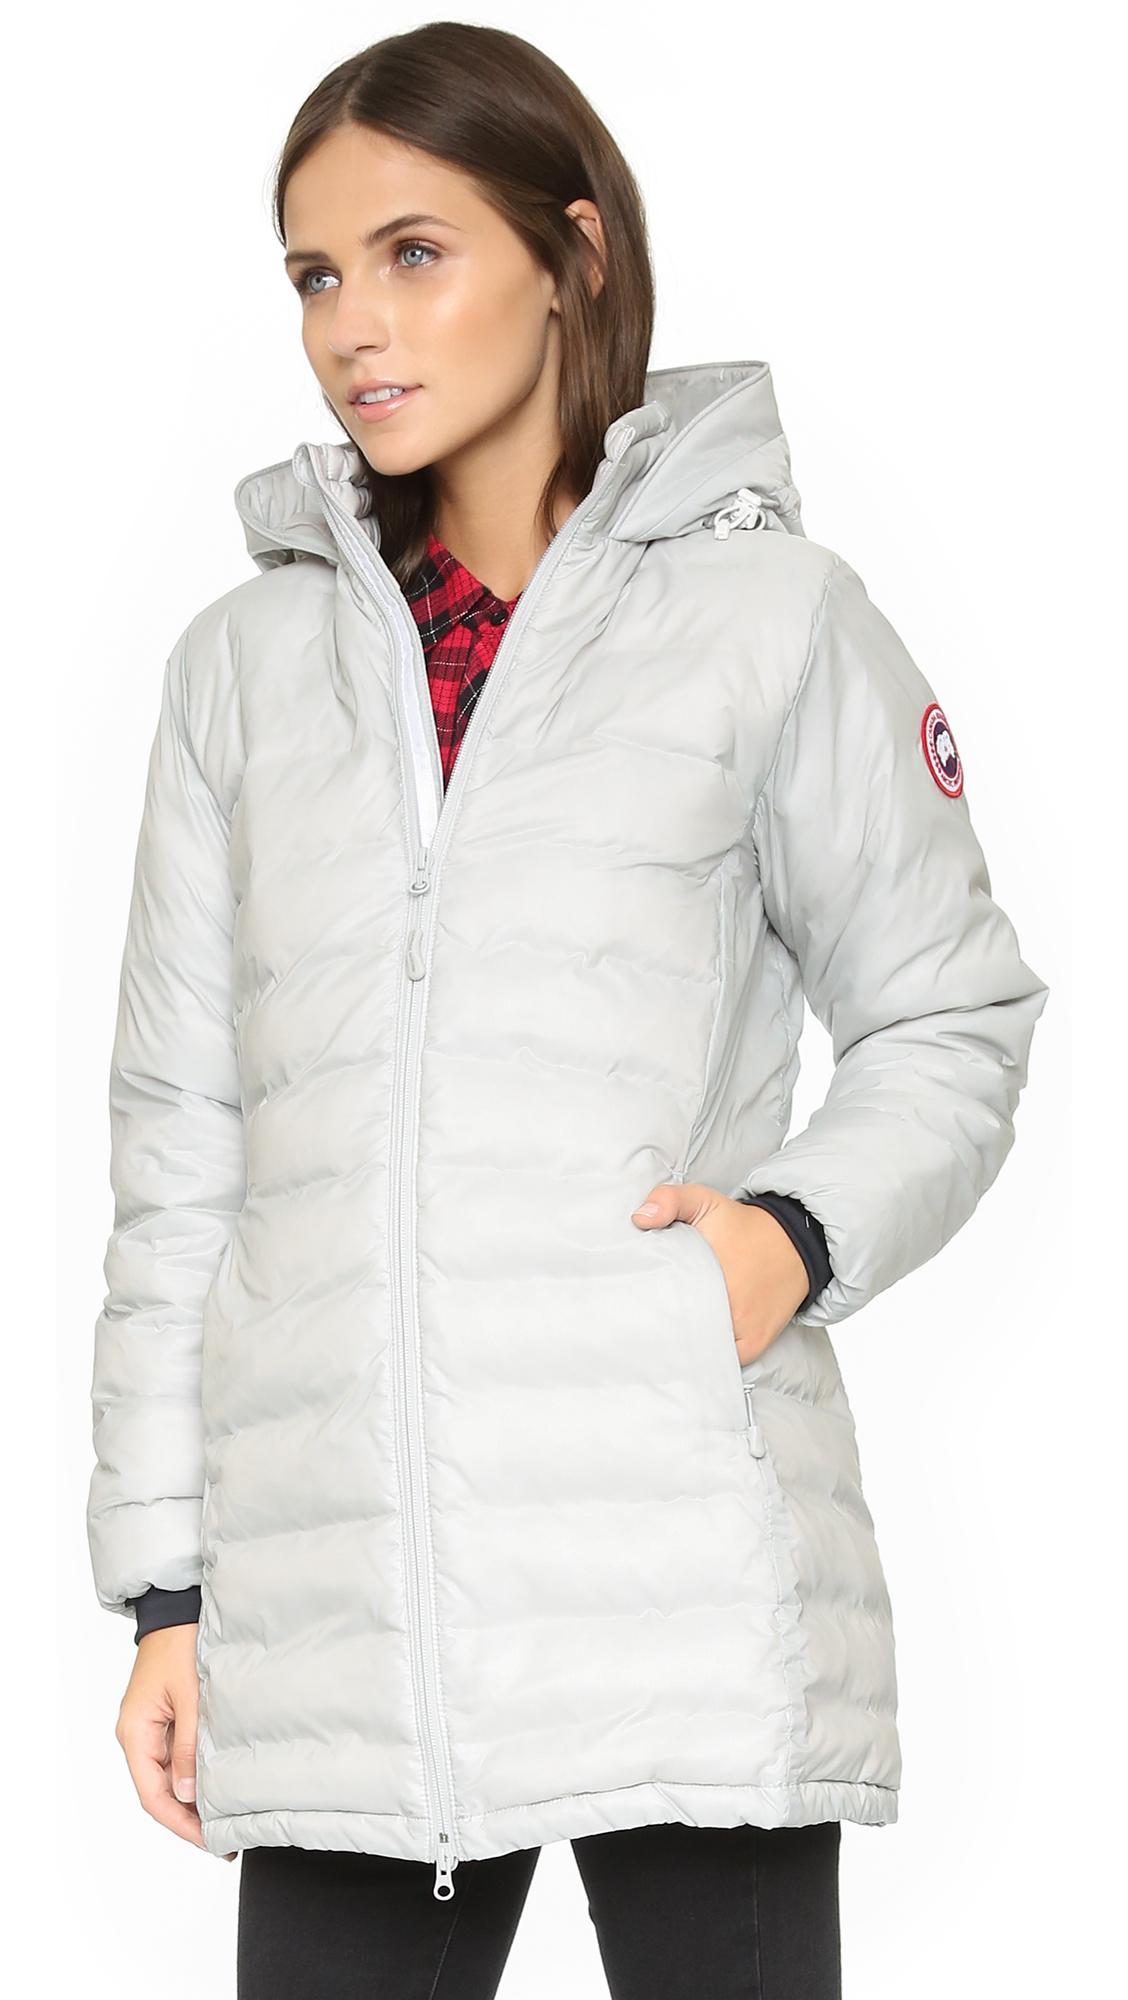 e1ed95c1d Canada Goose White Camp Hooded Jacket